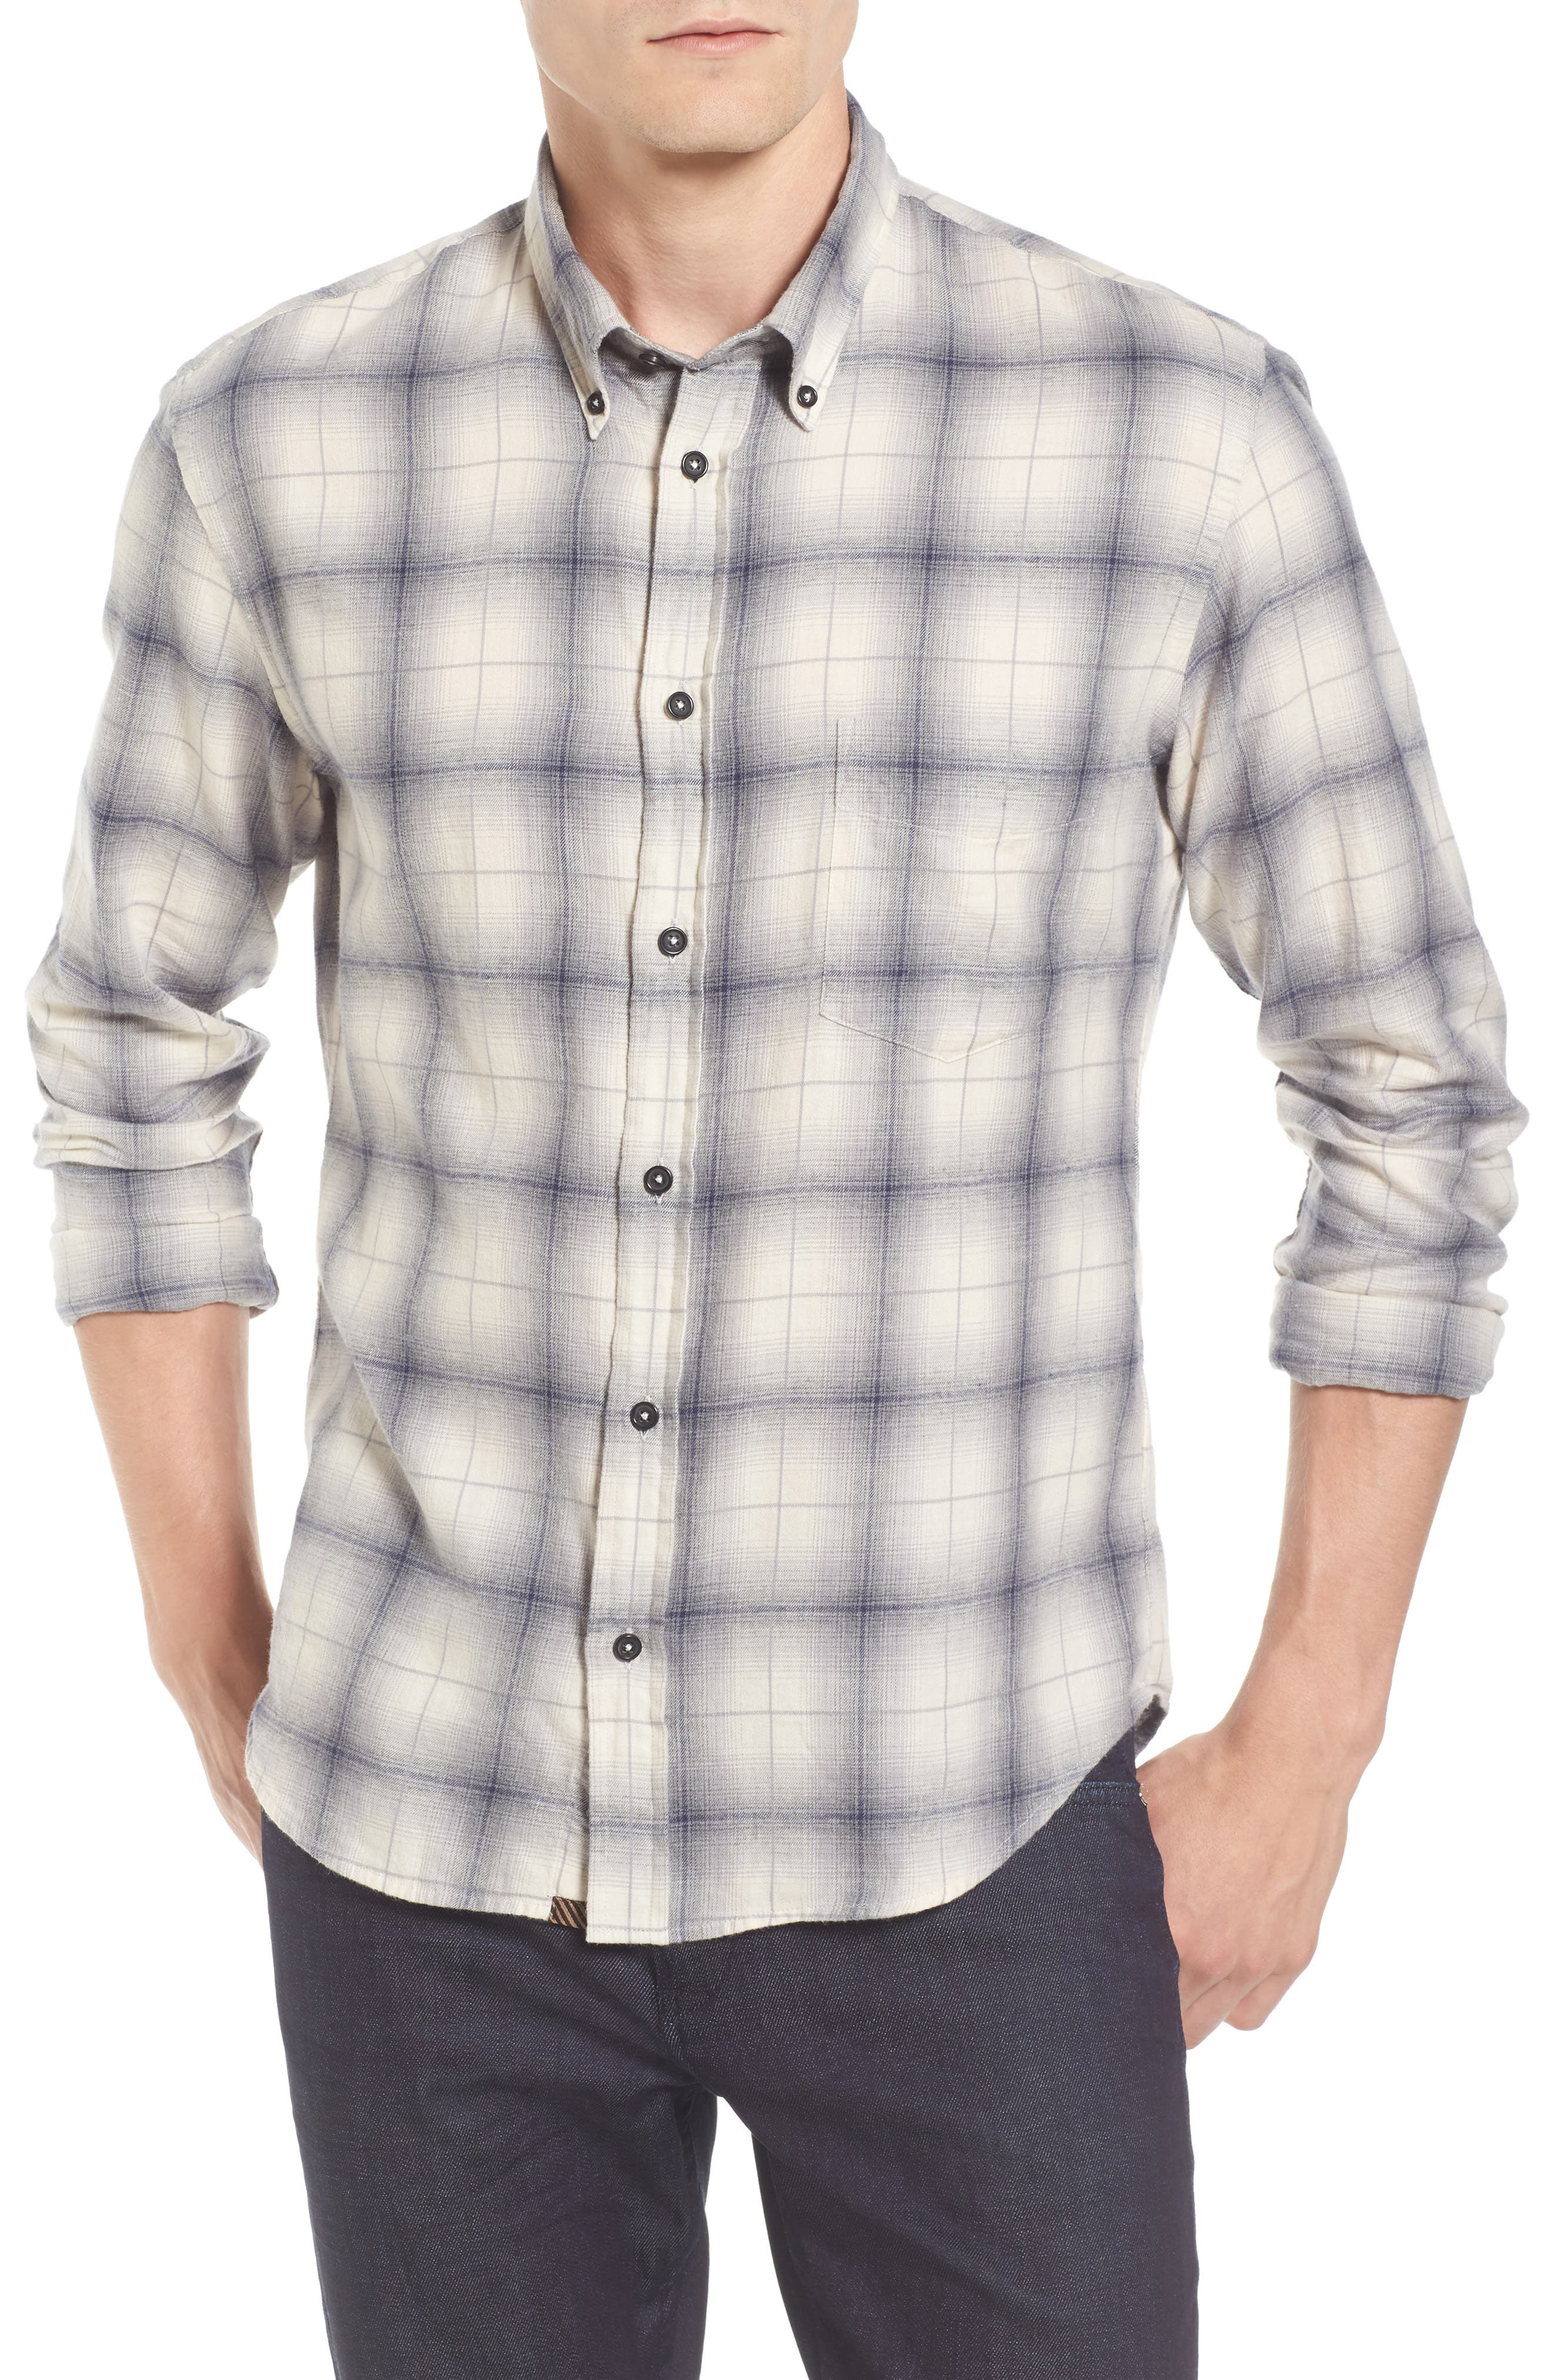 Kirby Slim Fit Plaid Flannel Shirt,                             Main thumbnail 1, color,                             070